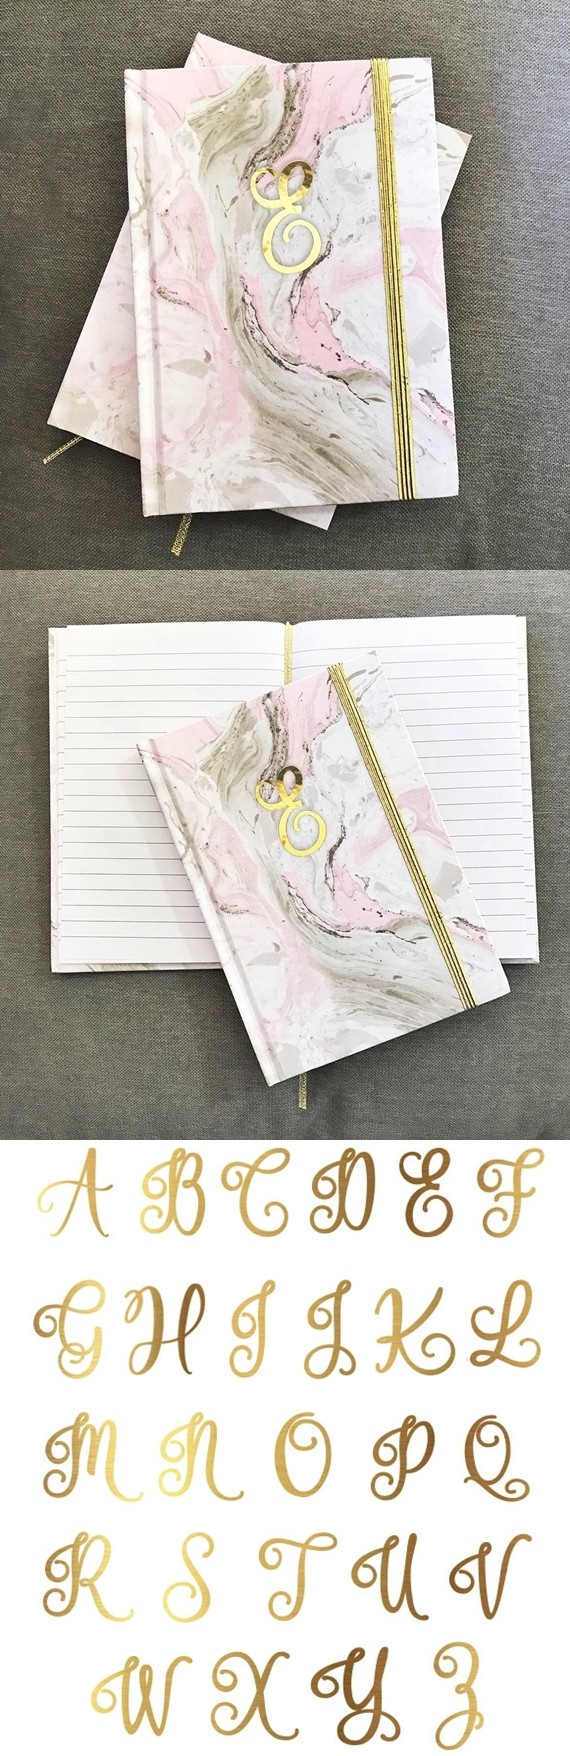 Event Blossom Gold Script Monogram Pink Marble Background Journal